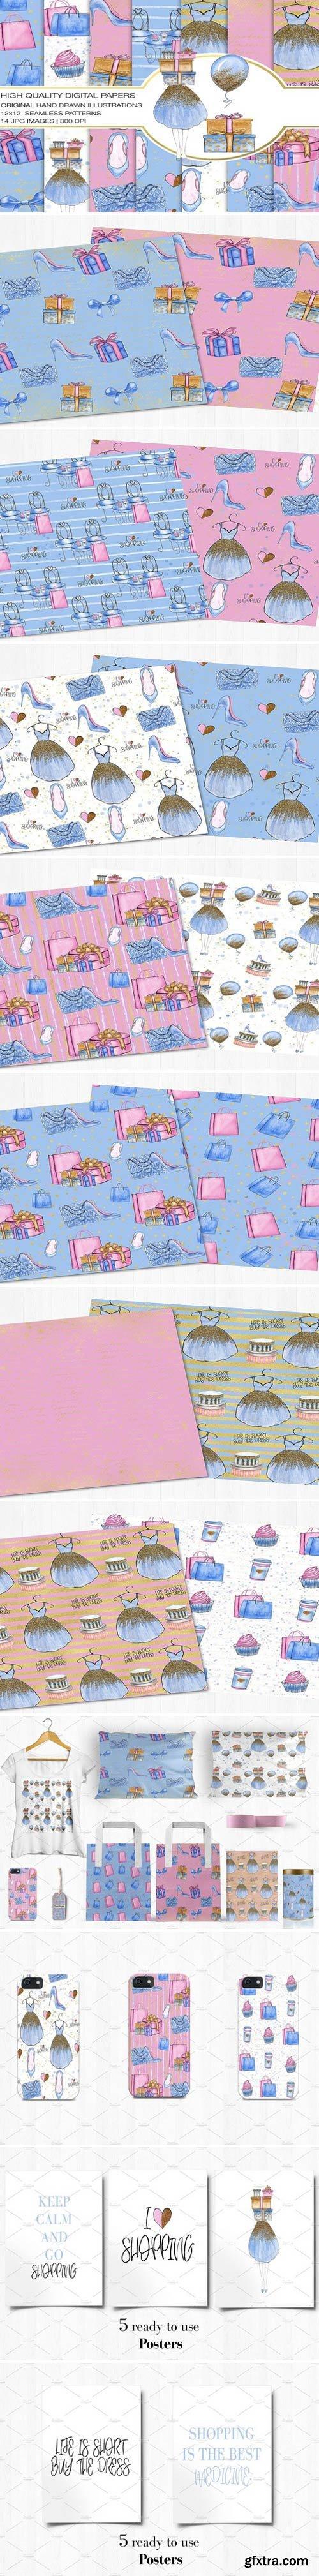 CM - Shopping Digital Paper+Bonus Posters 2200382